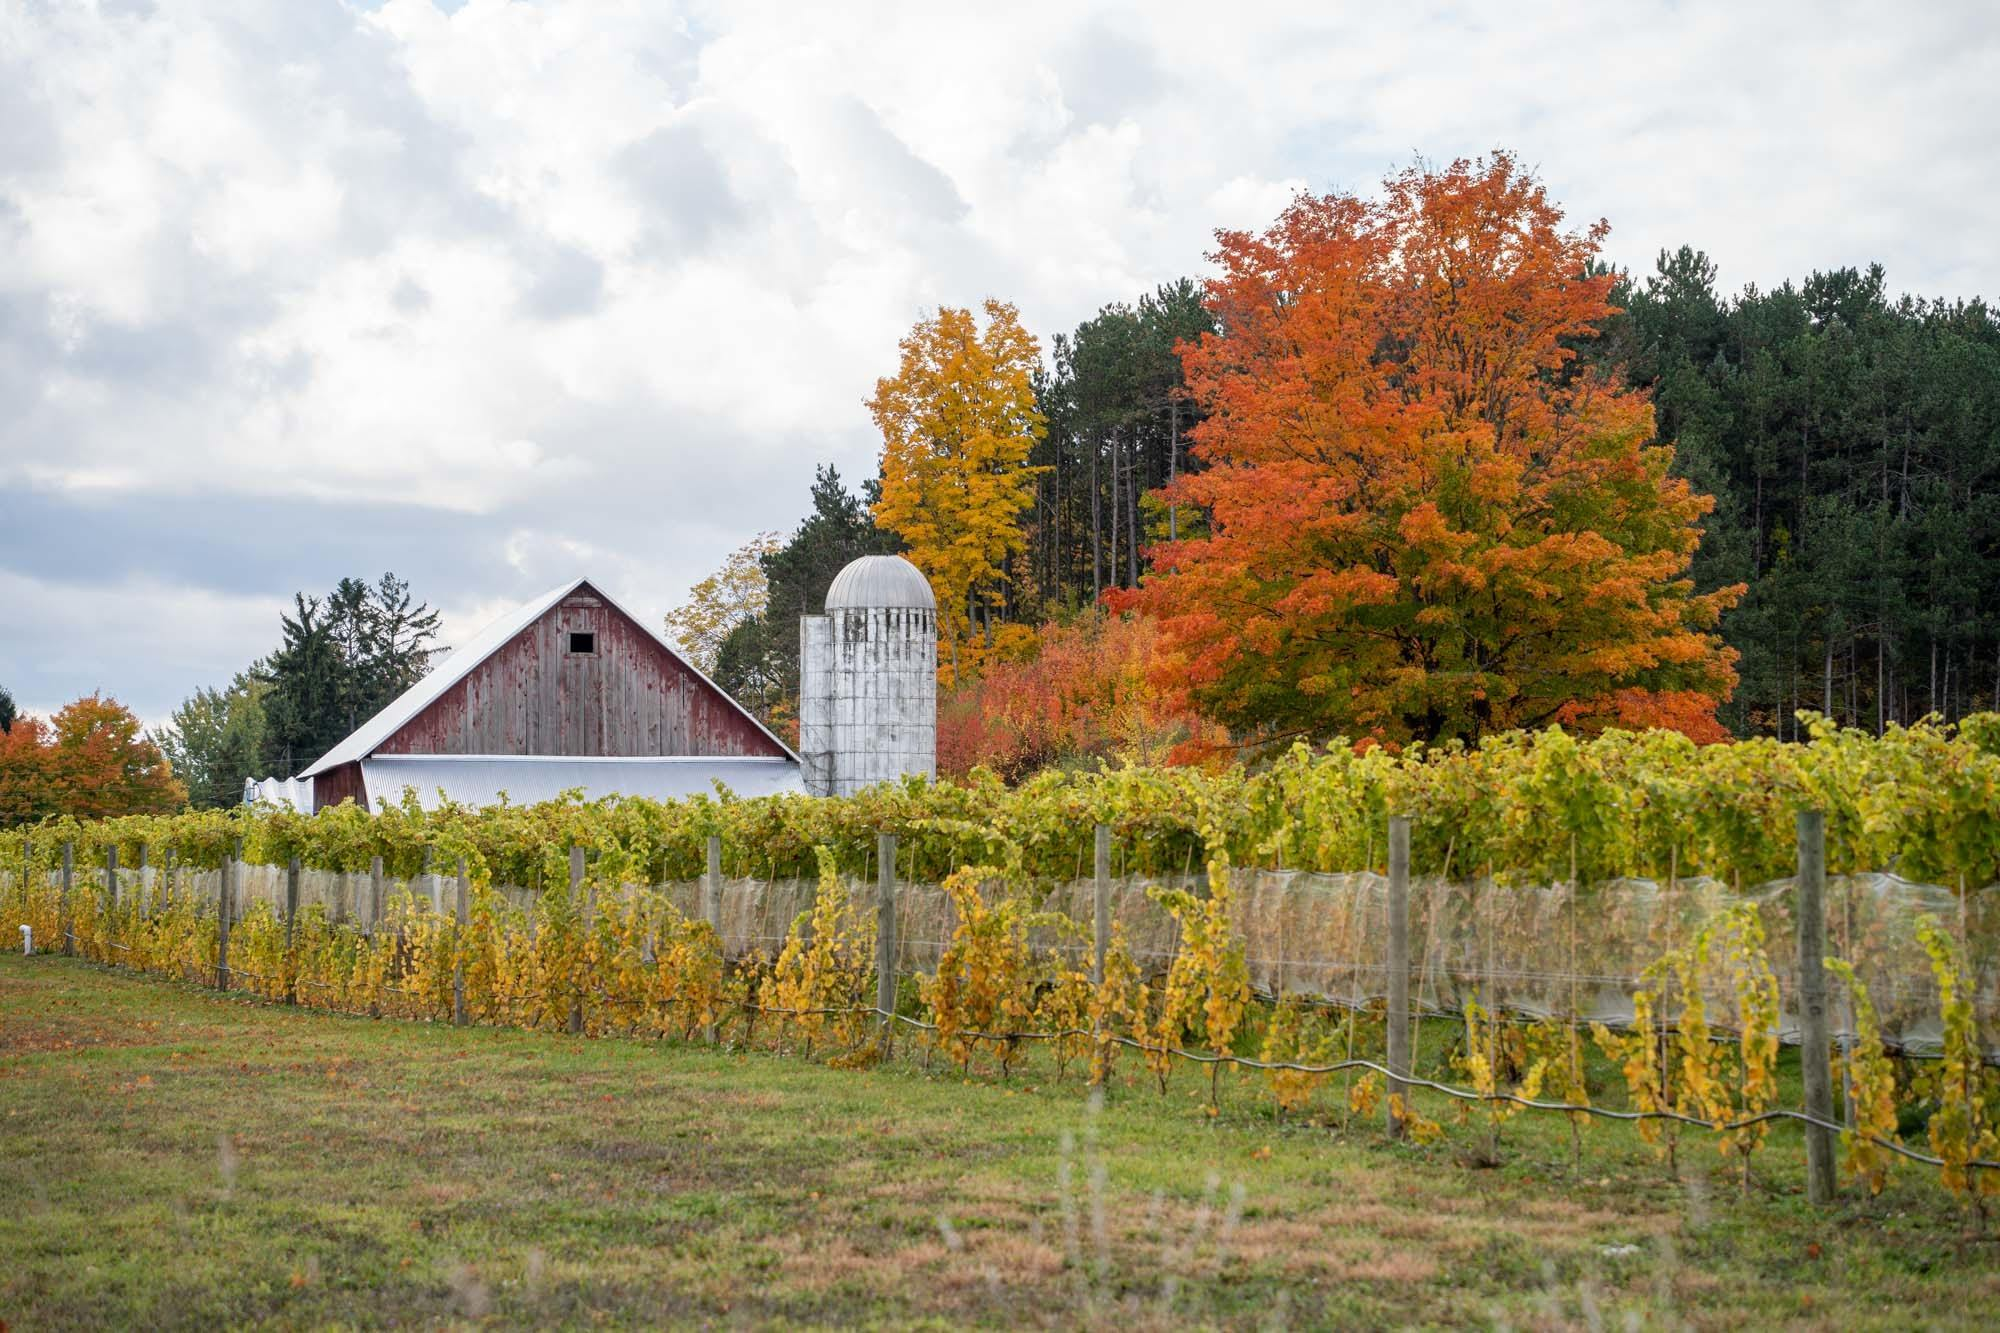 Vineyard and barn on the Leelanau Peninsula